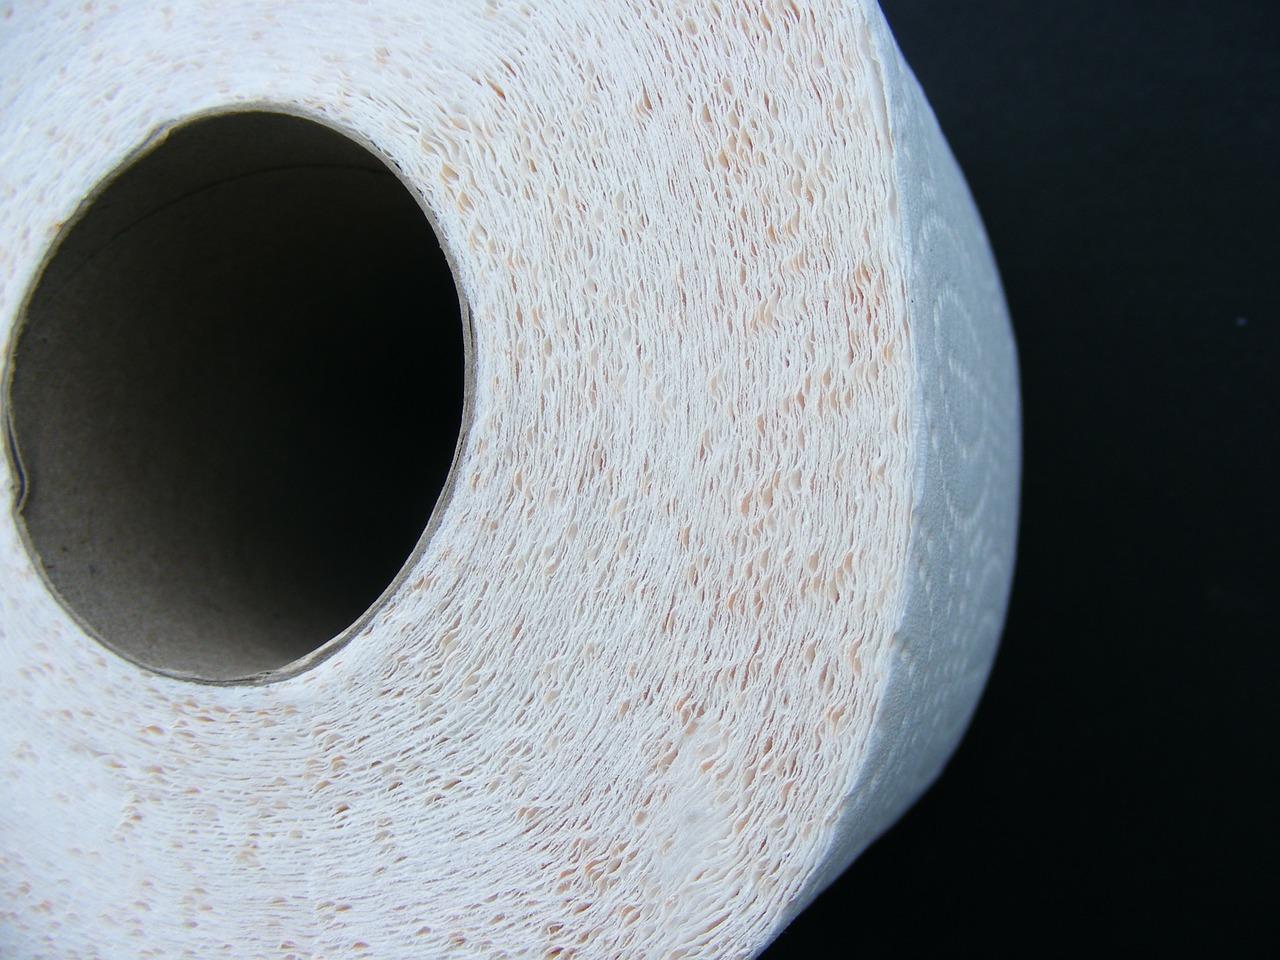 Toilet Paper 87390 1280